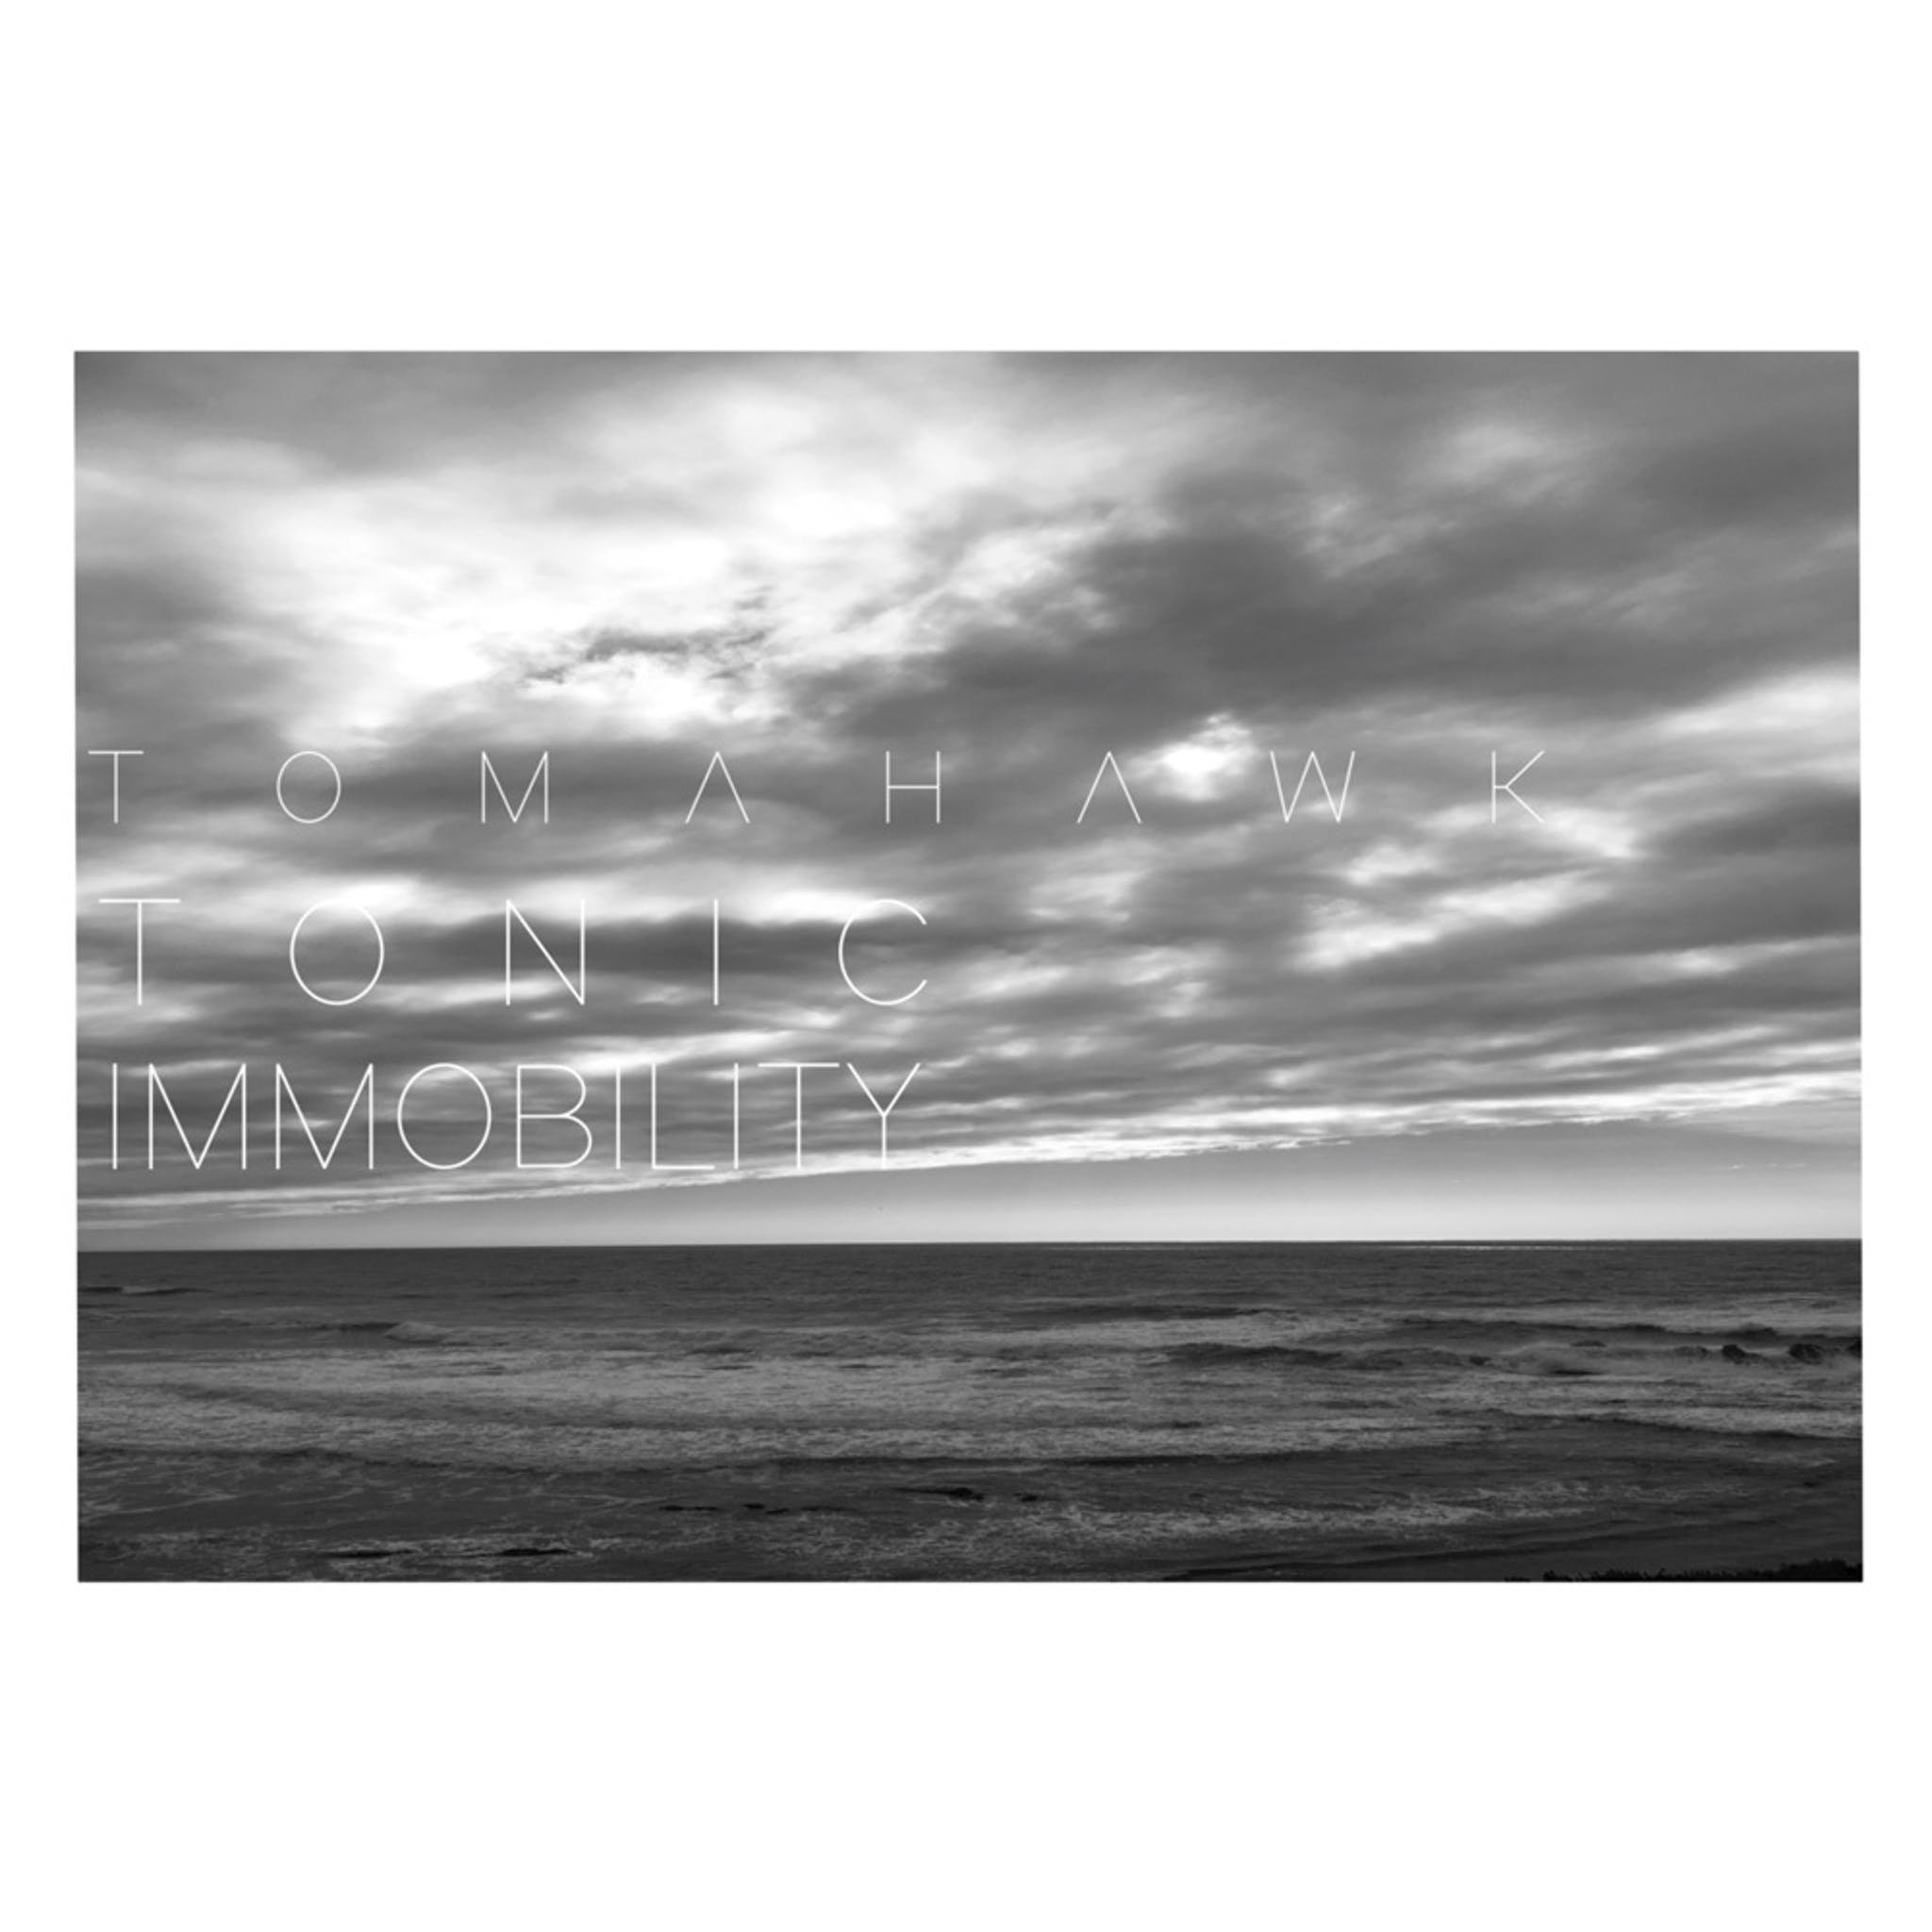 Tomahawk Tonic Immobility album cover